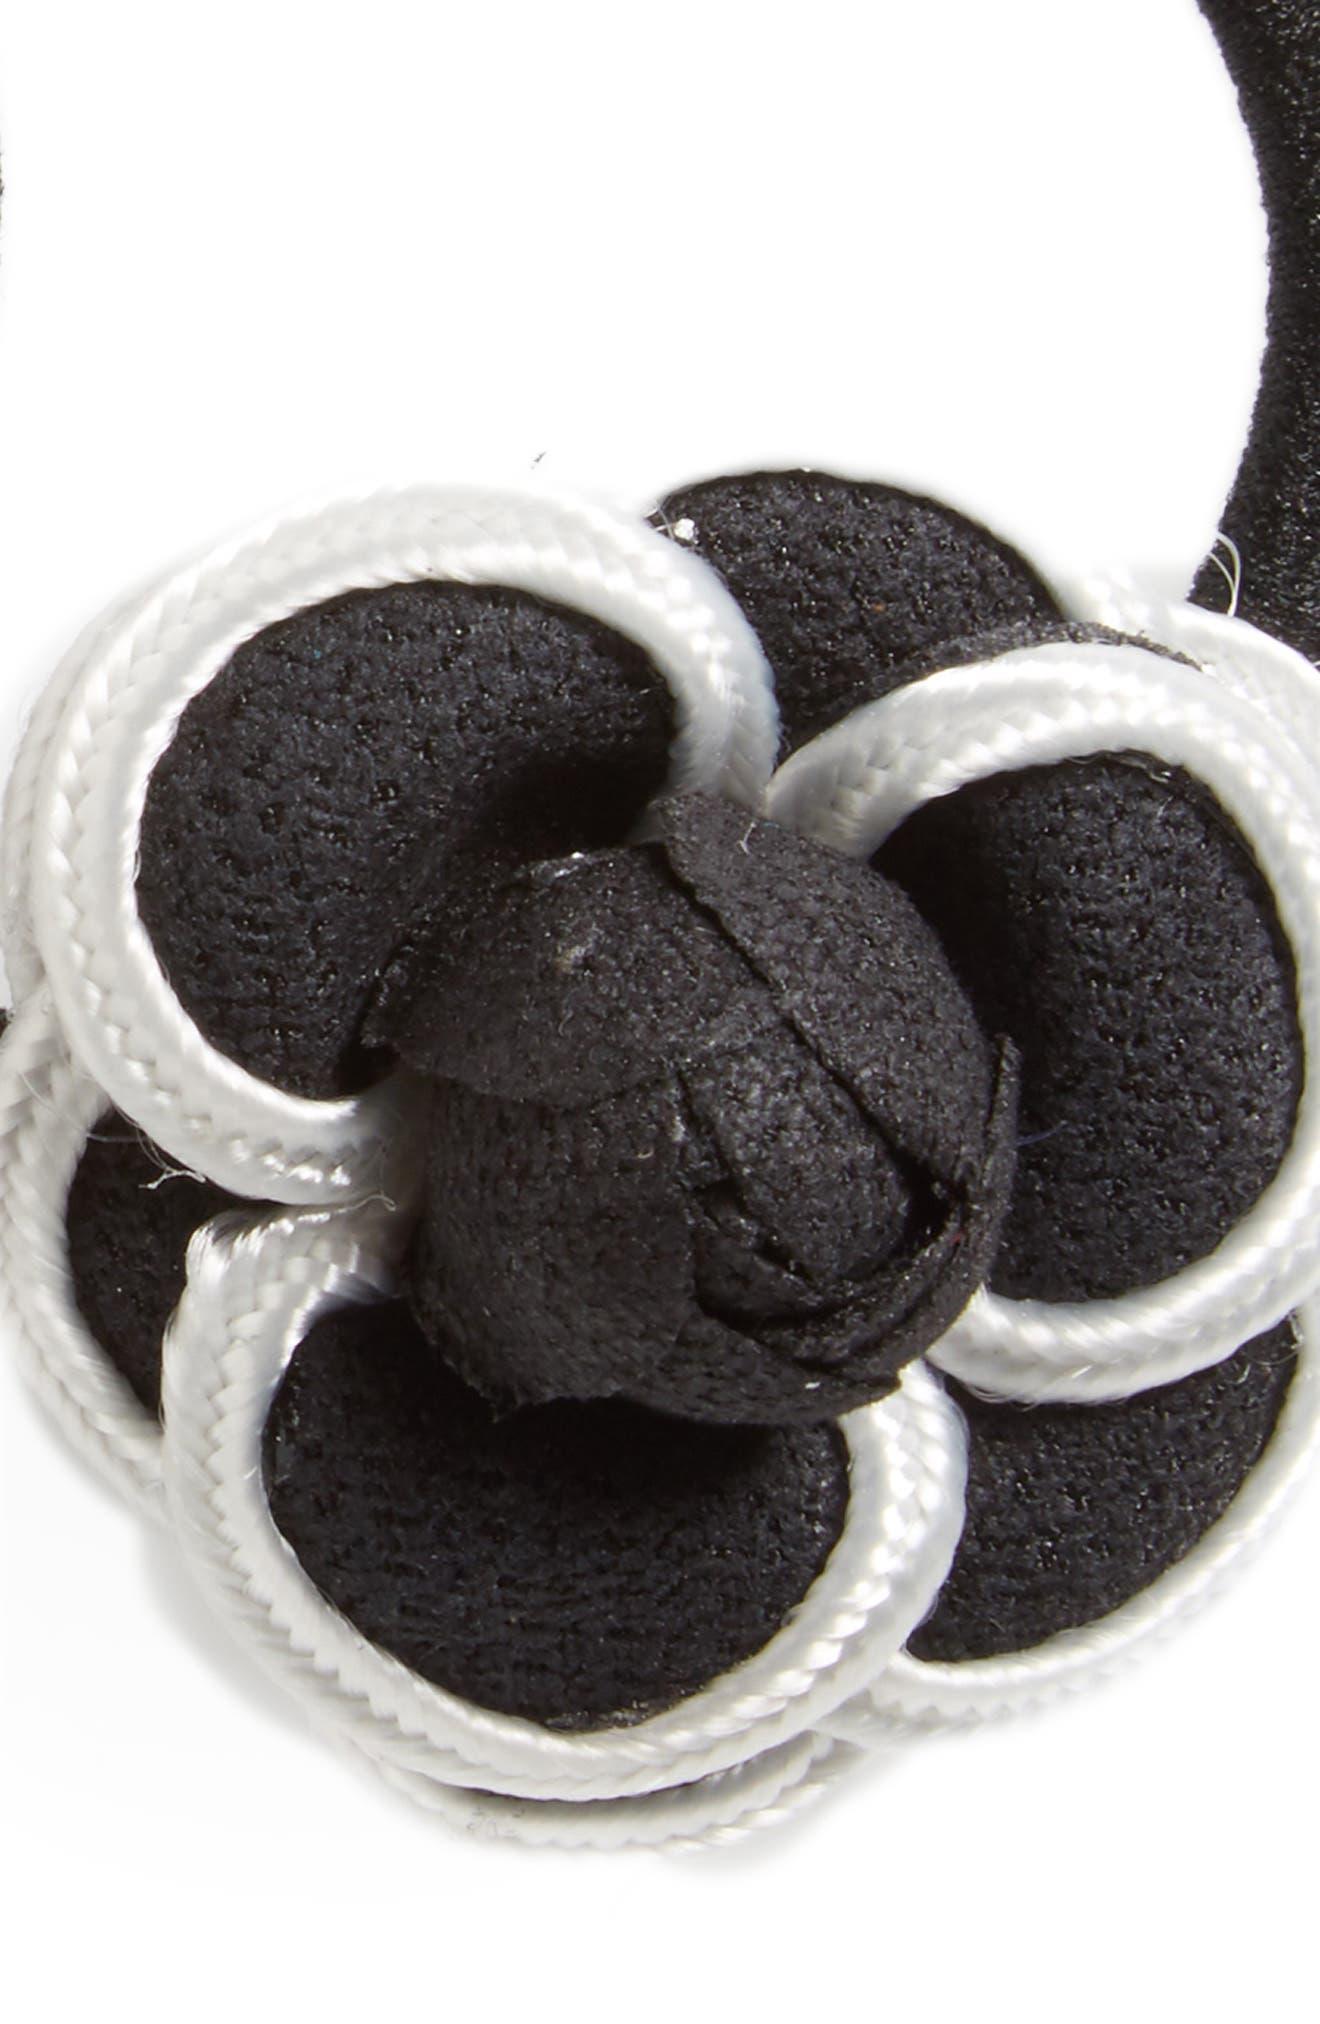 2-Pack Floral Ponytail Holders,                             Alternate thumbnail 2, color,                             Black/White